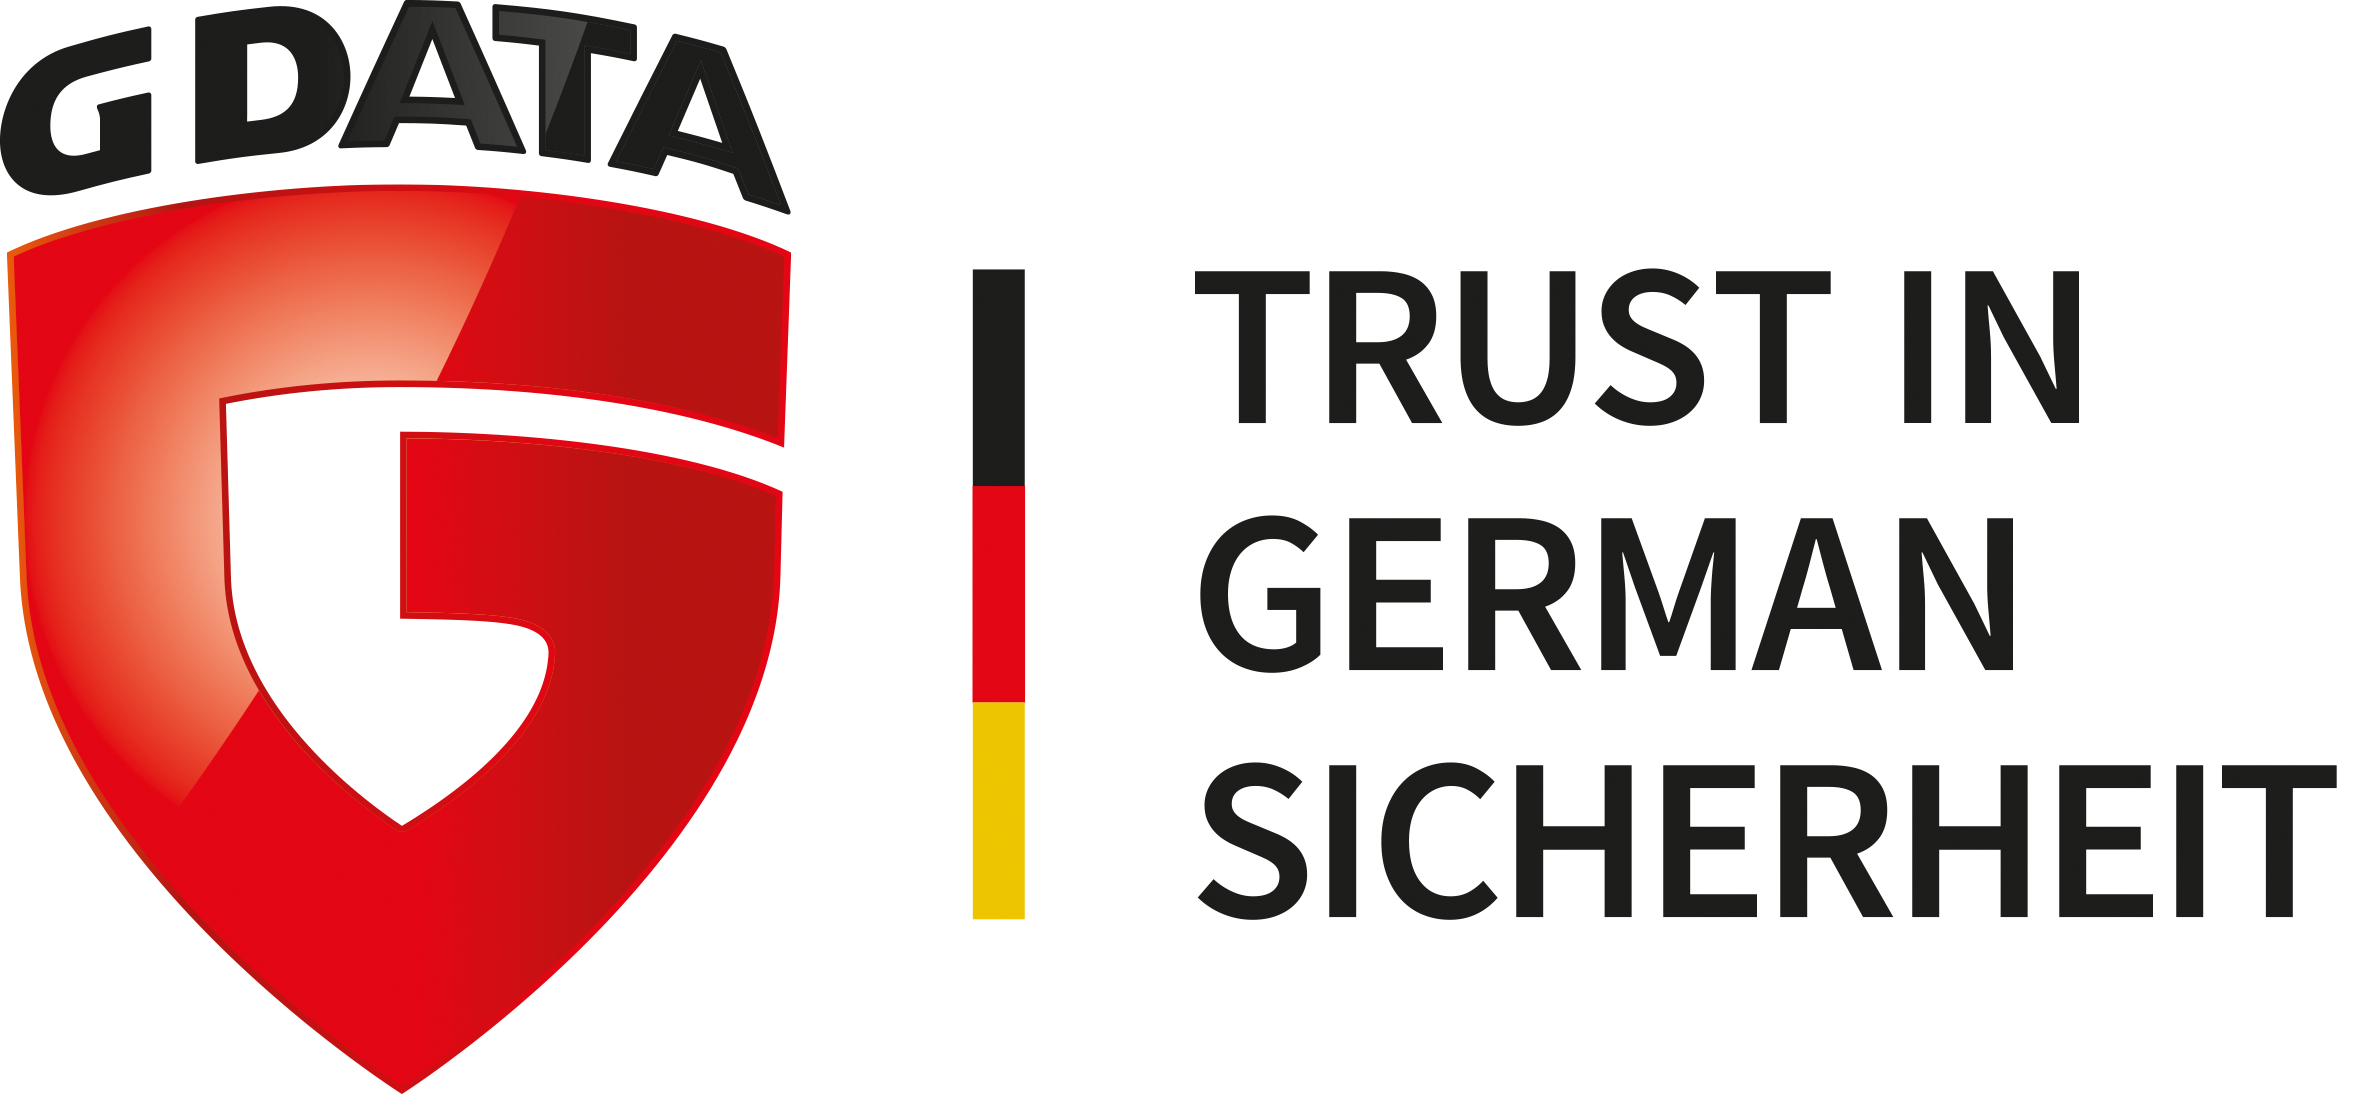 G data logo tigs 2017